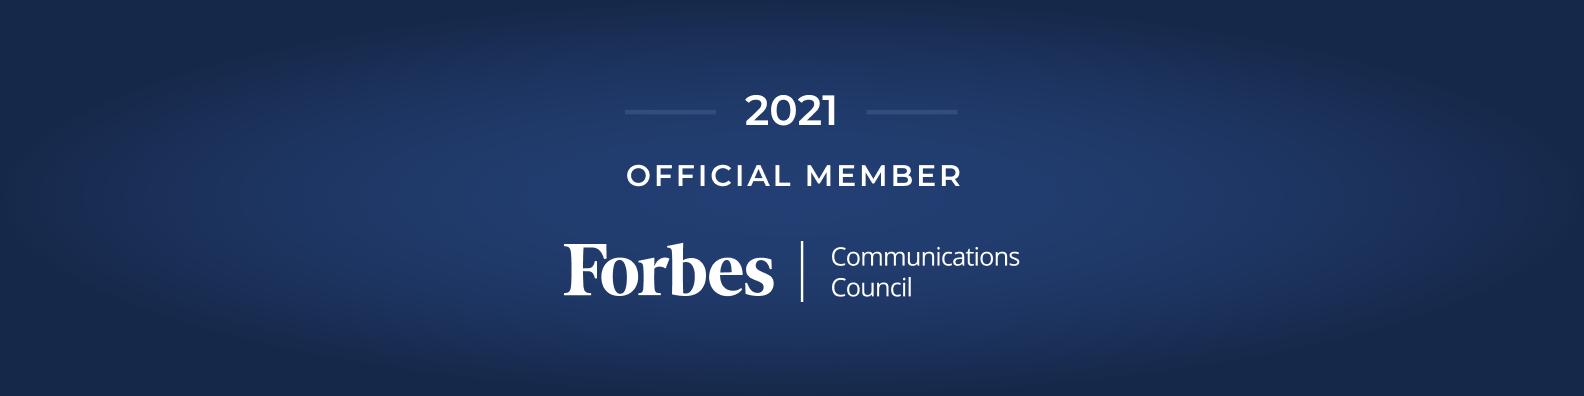 FC2-Social-LinkedIn-Cover-2021